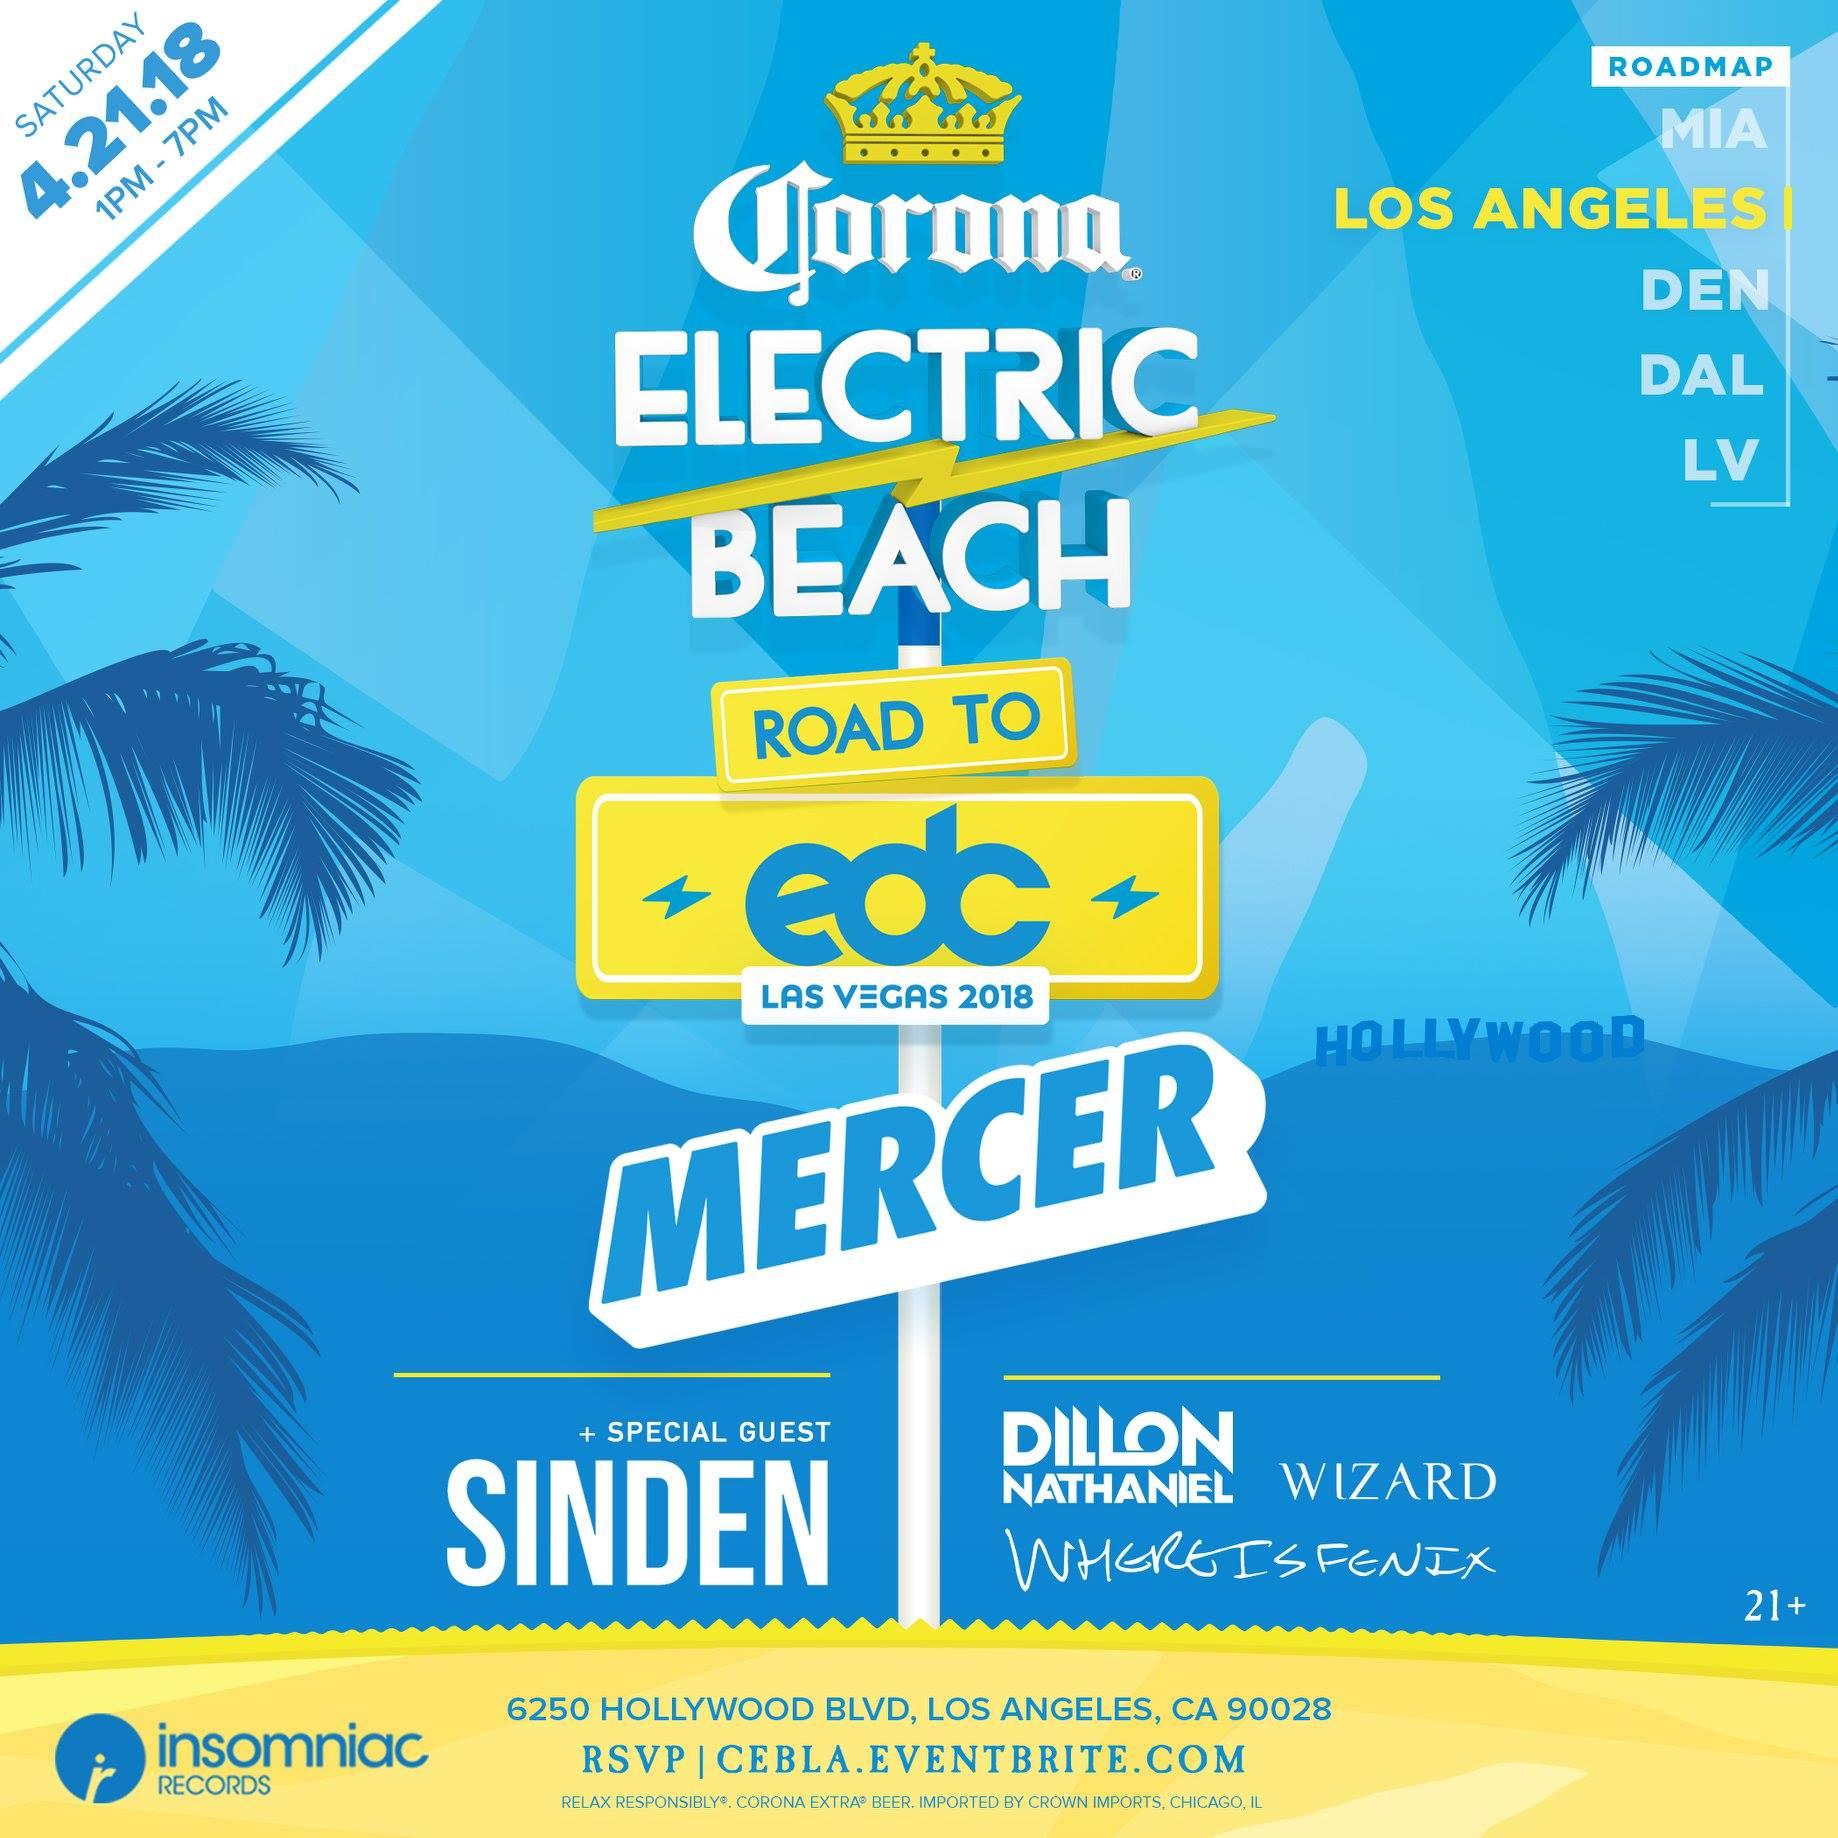 corona electric beach la 2018 flyer edm identity